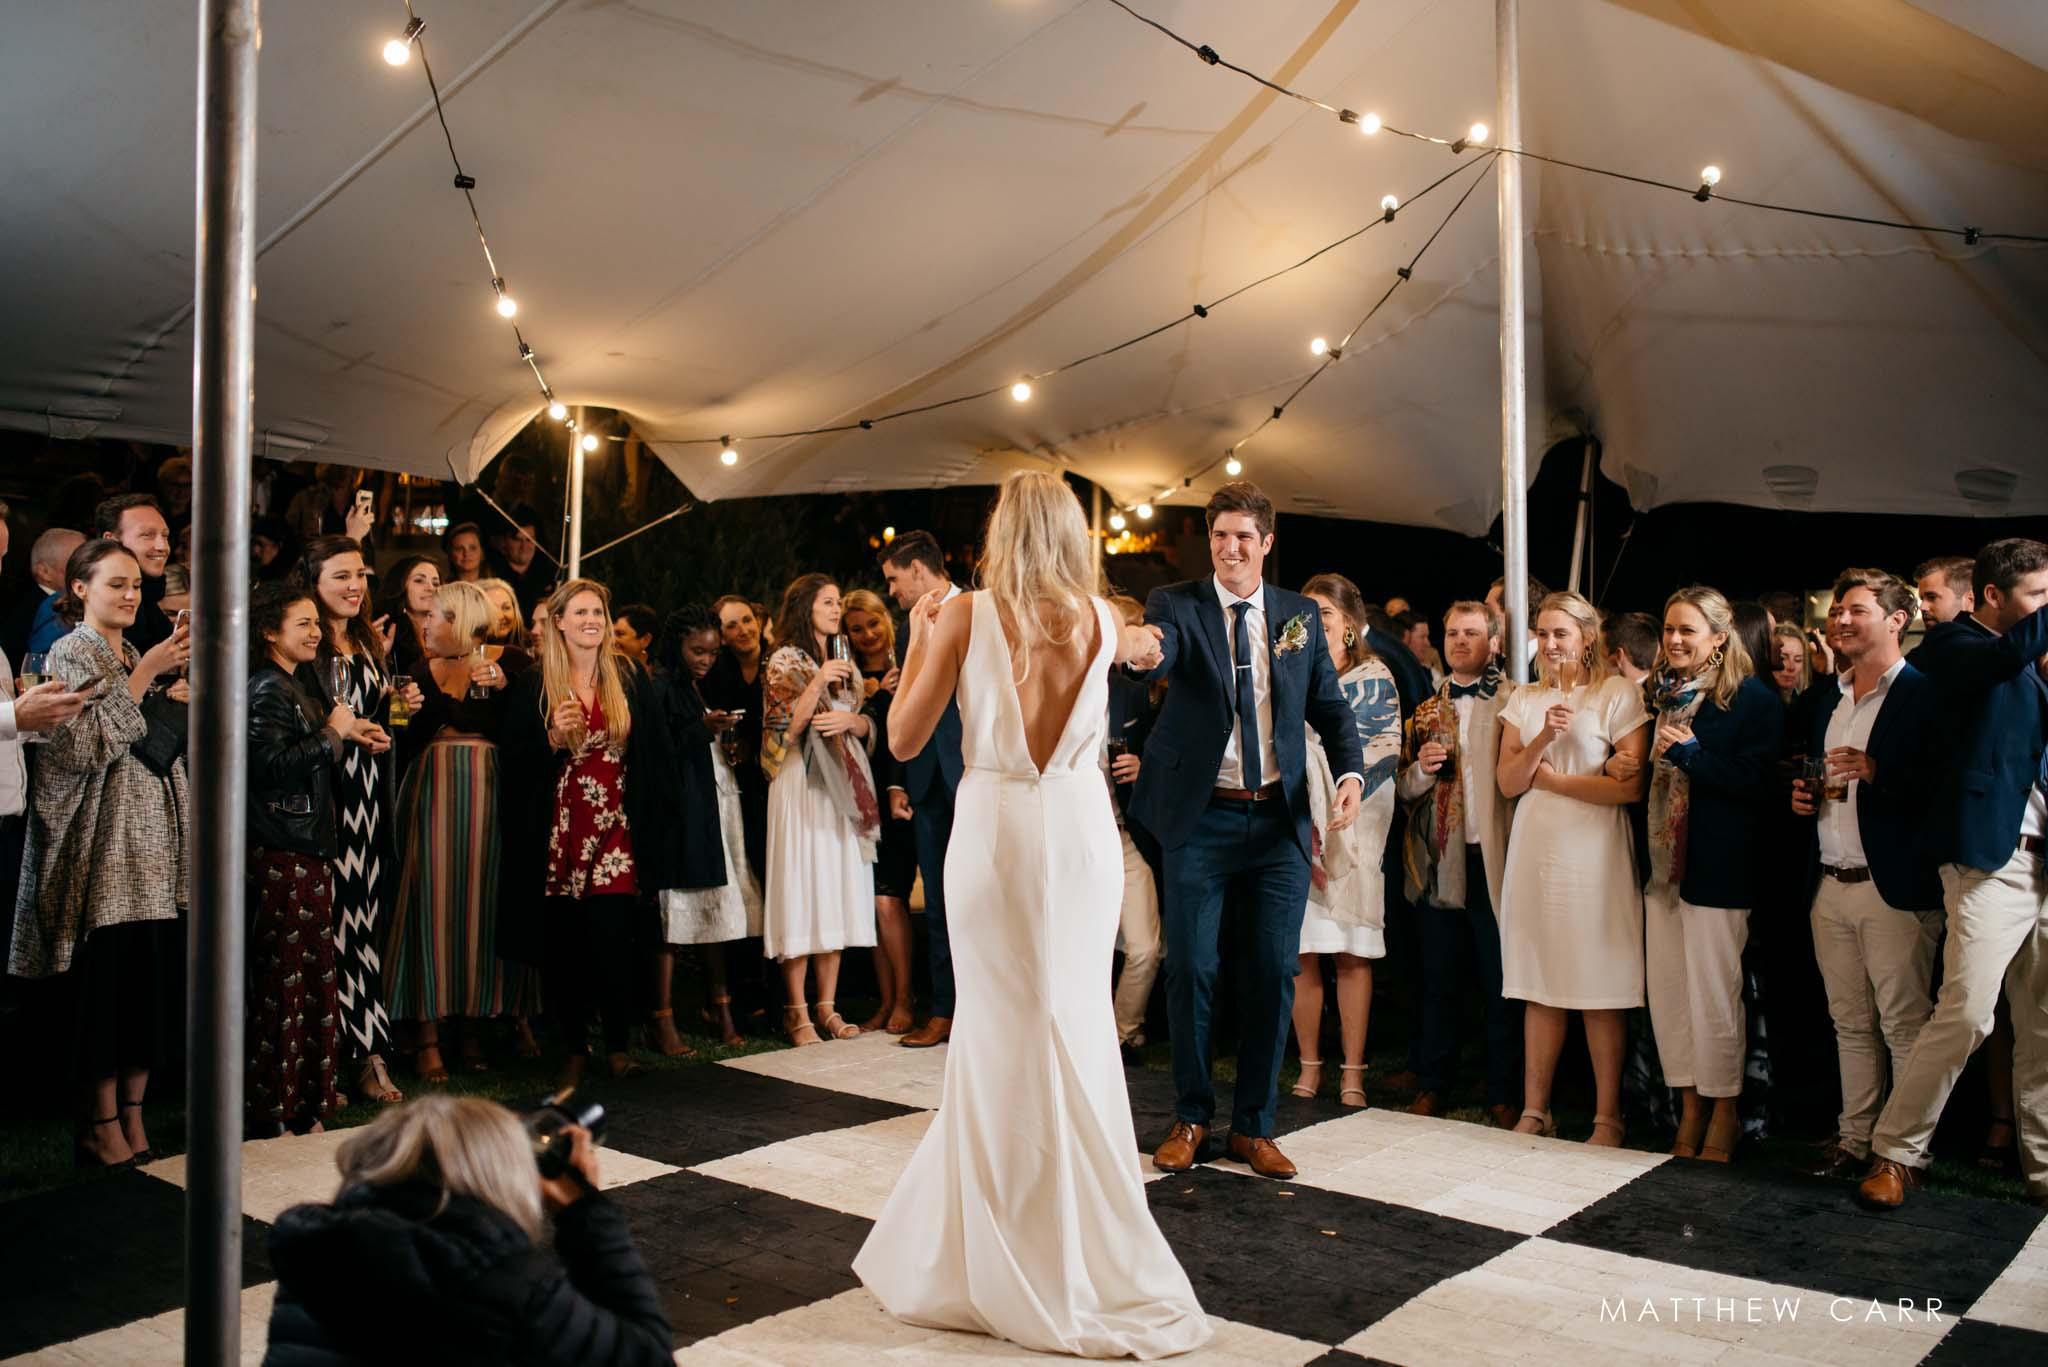 first dance, wedding dress, bride, groom, st francis, wedding